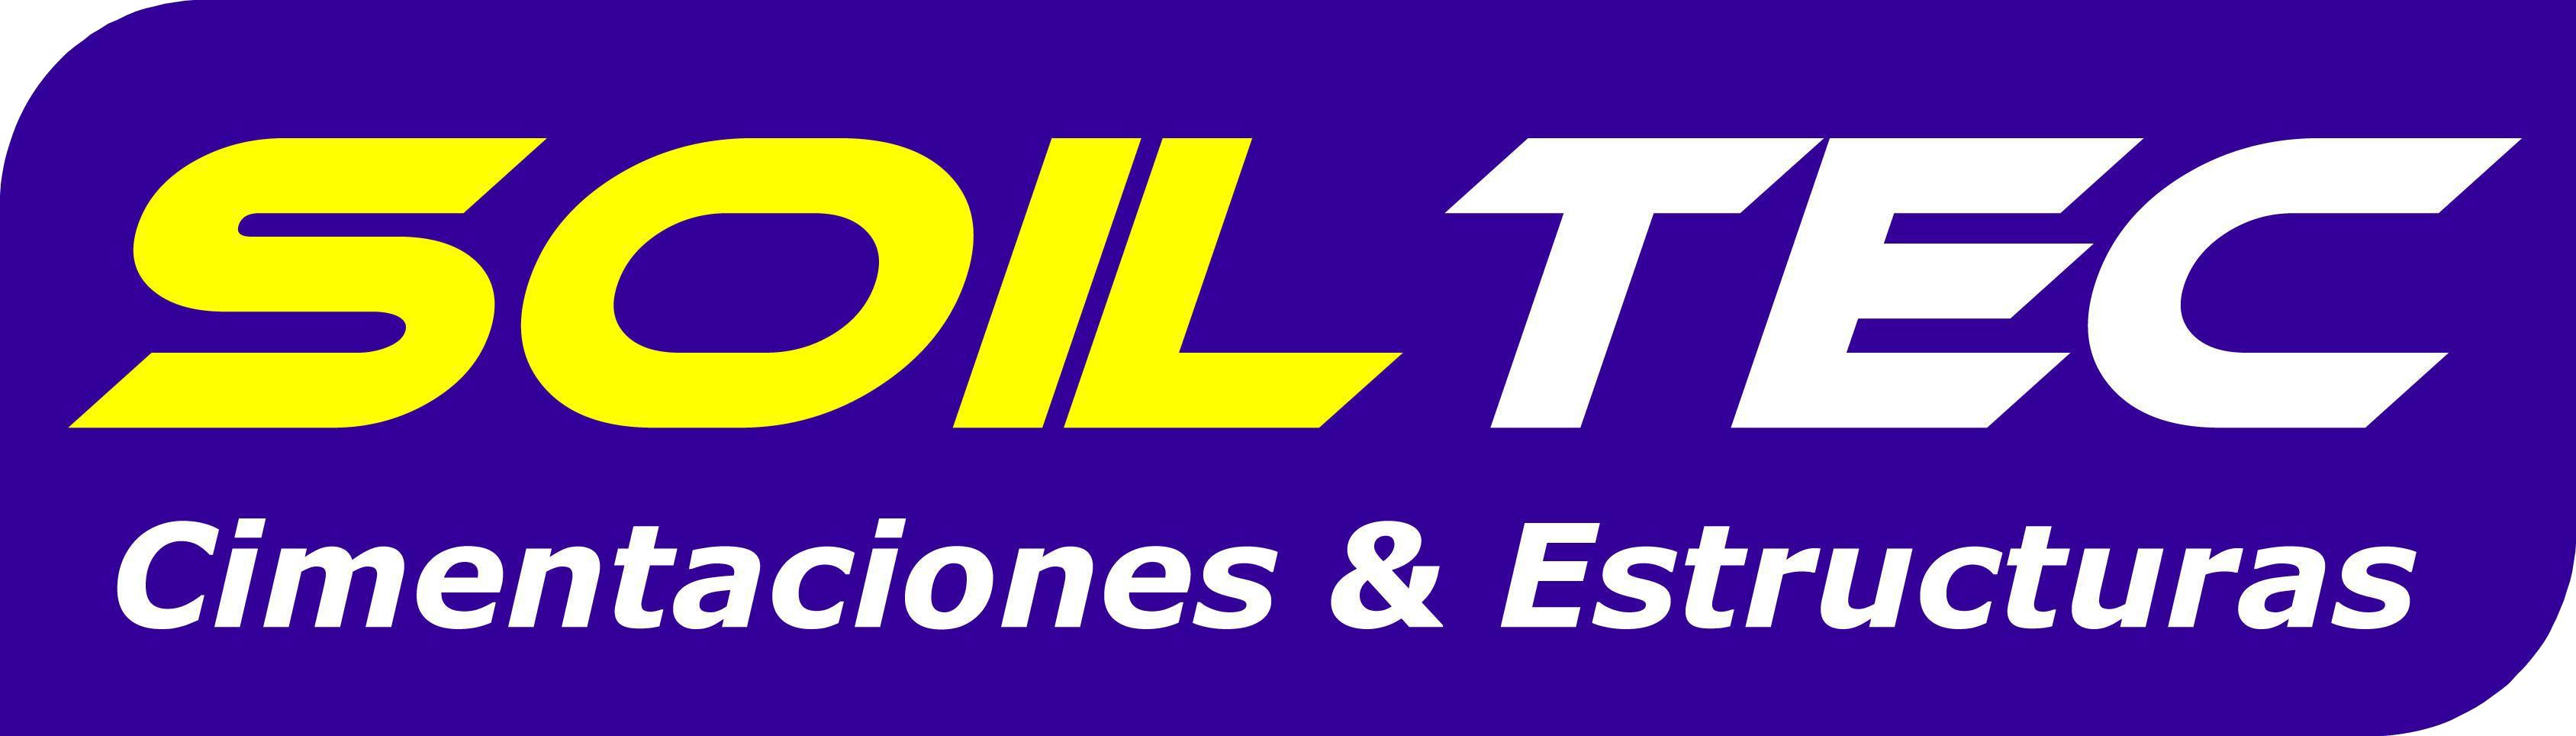 logo soiltec r0